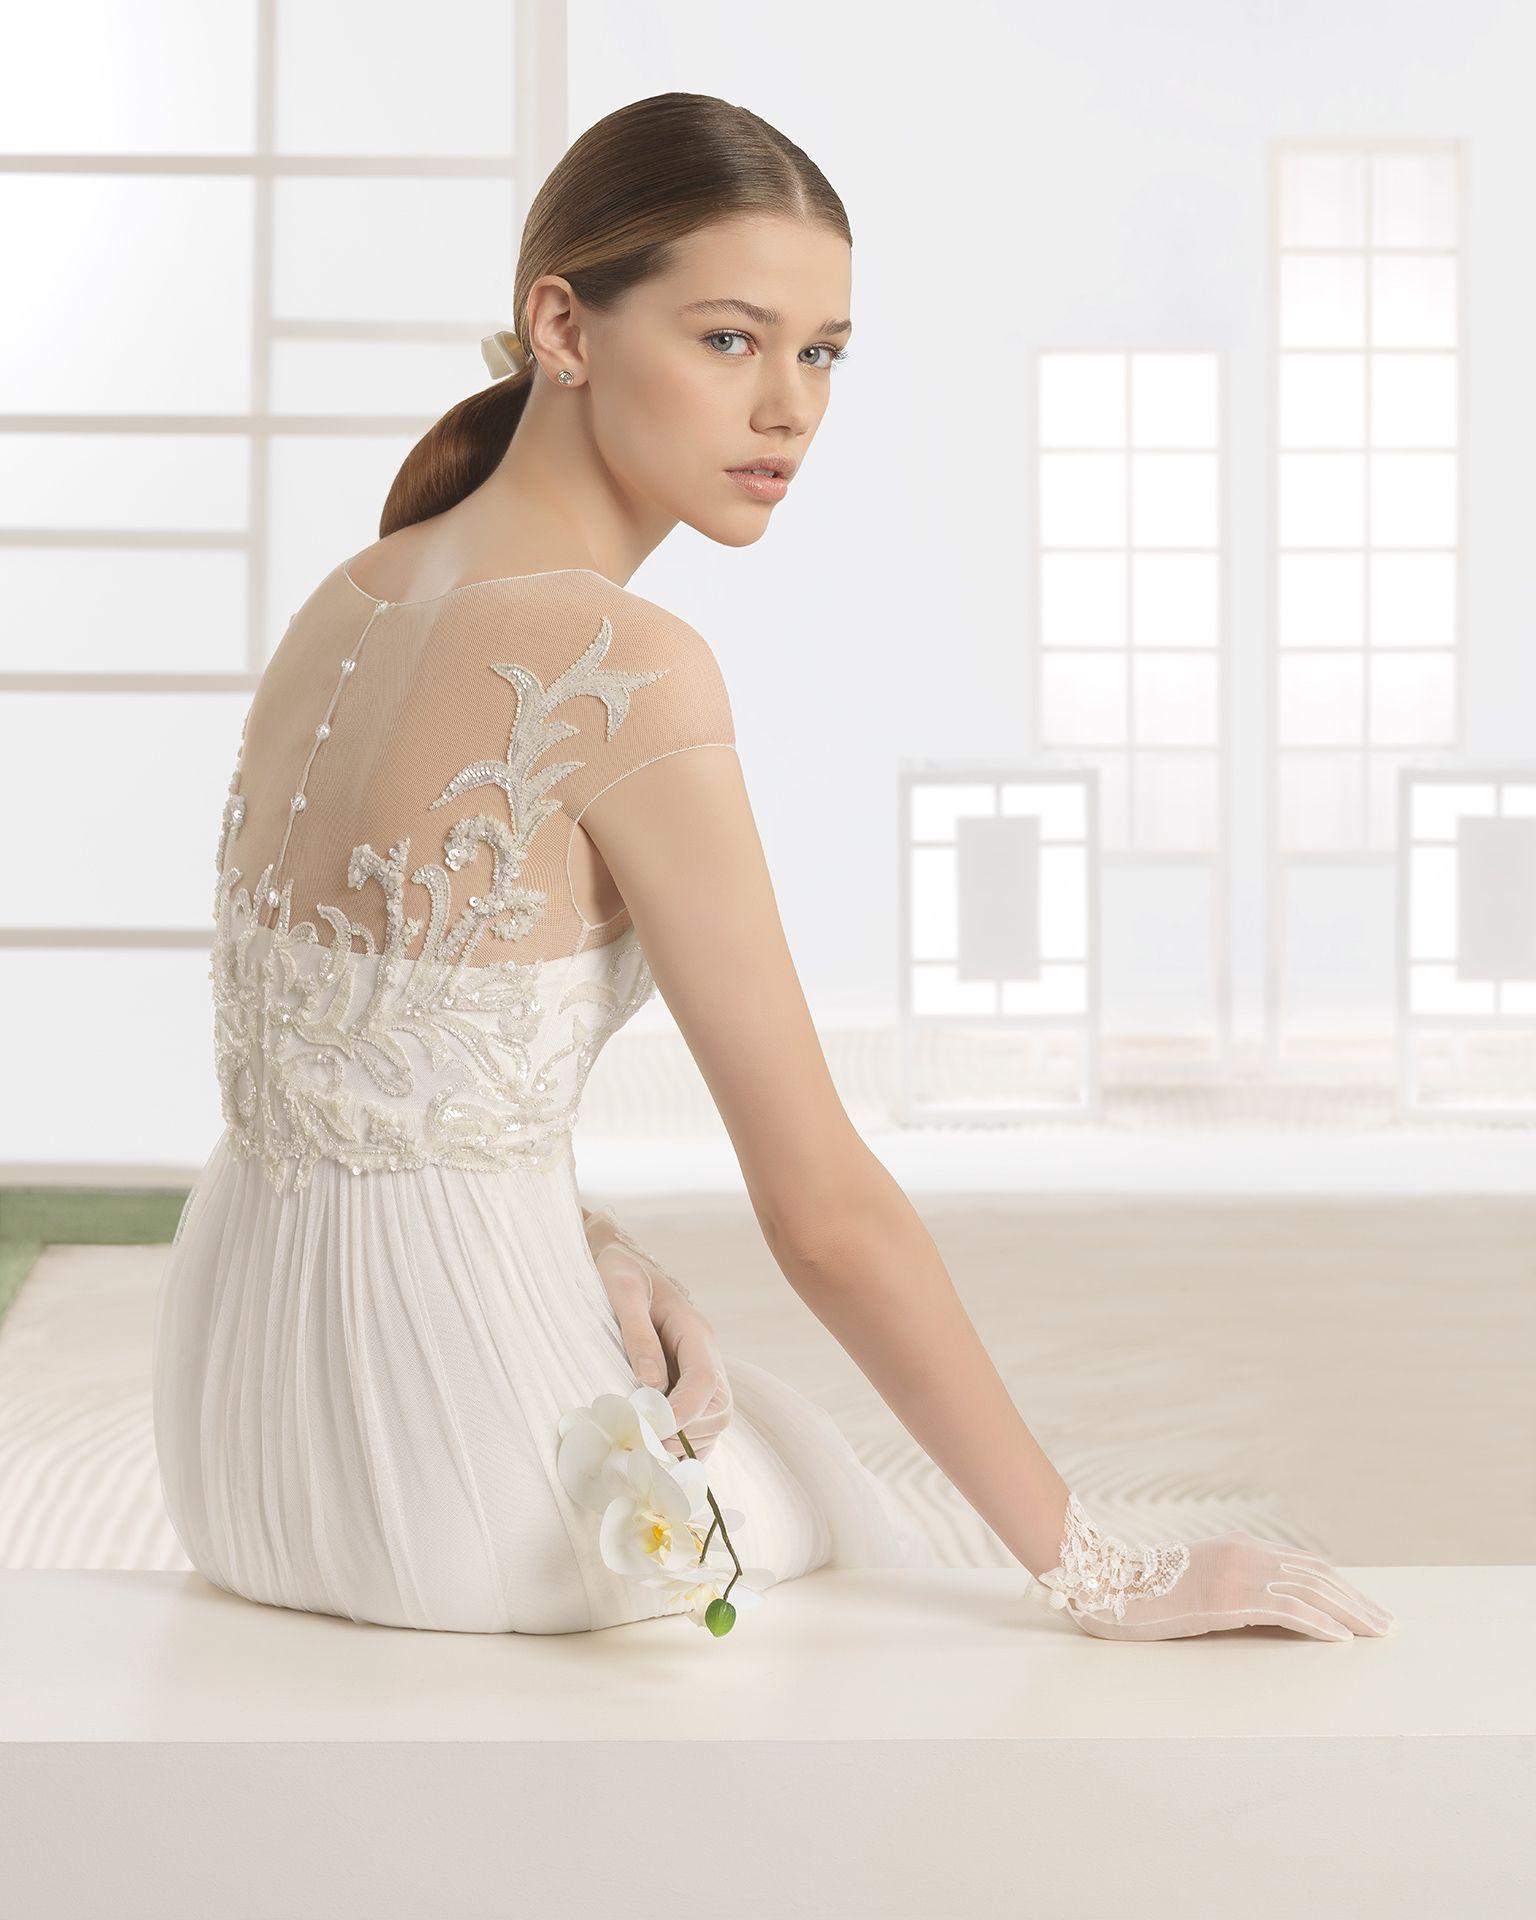 Whitney 2017 Bridal Collection Rosa Clará Soft Xxx